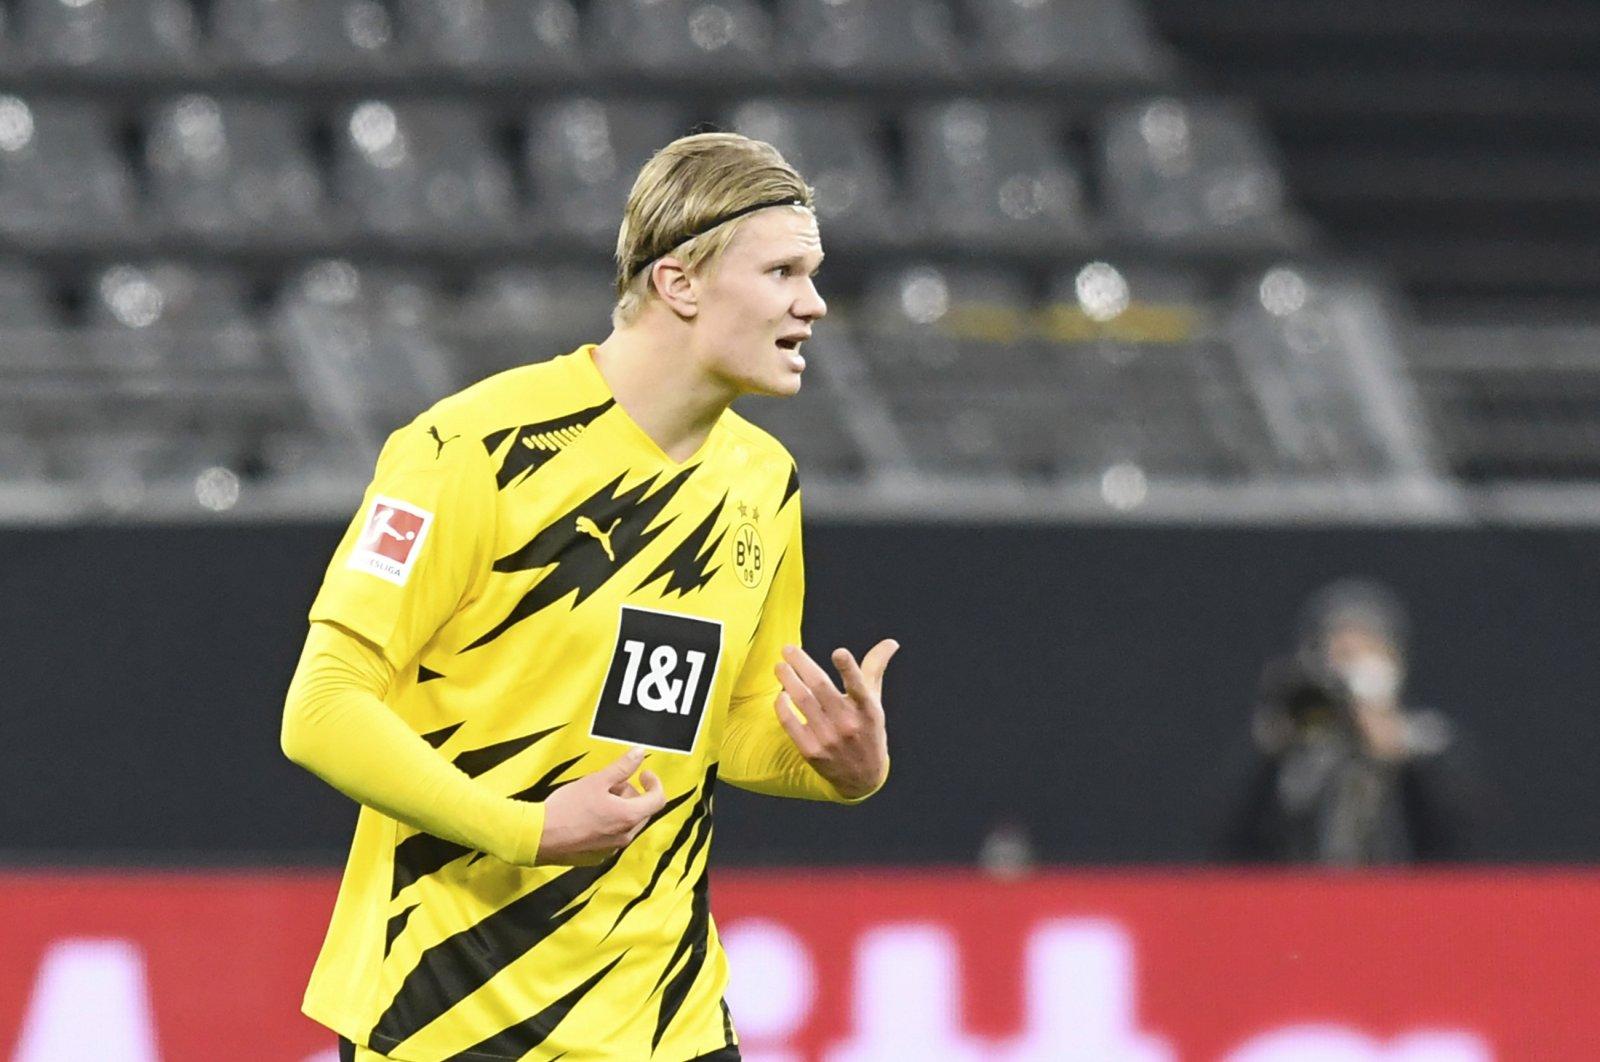 Dortmund's Erling Haaland celebrates scoring a goal during the German Bundesliga soccer match between Borussia Dortmund and Bayern Munich at Signal Iduna Park, in Dortmund, Germany, Nov. 7, 2020. (Pool via AP)